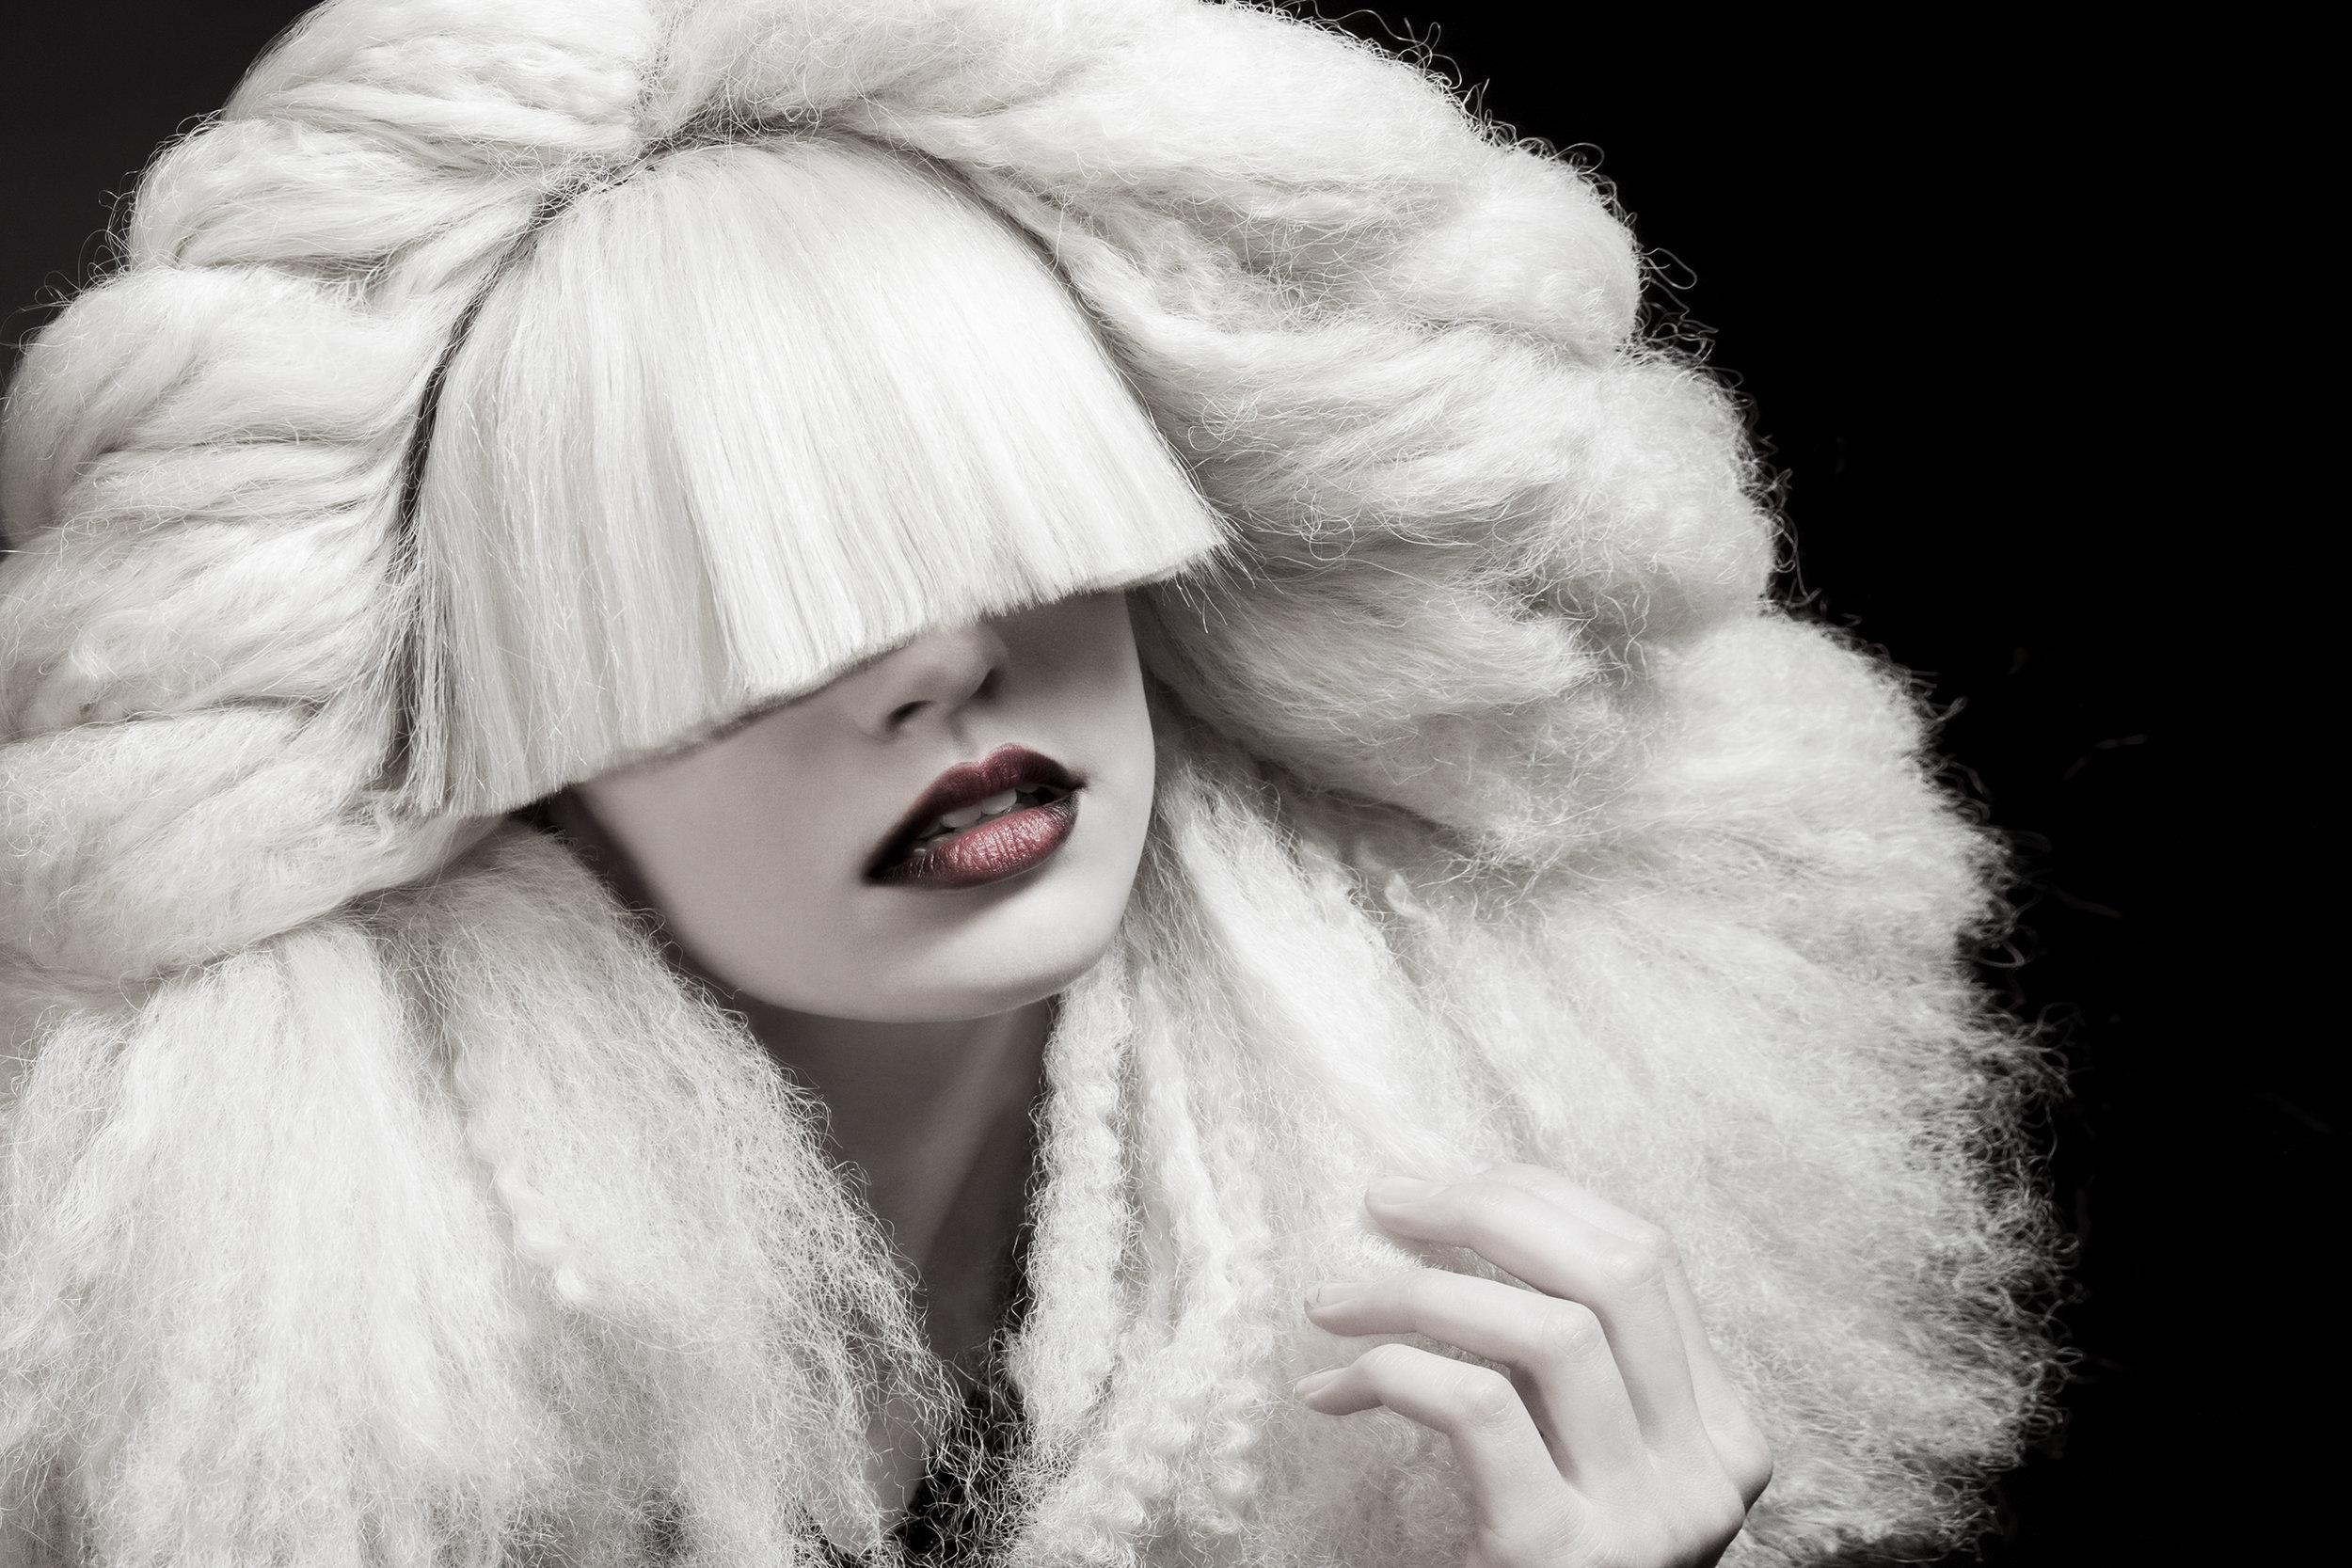 fashion-edgy-editorial-dark-gothic-bighair-platinum-blonde-moody-leather-sleek-black-beuty-hombre-makeup-redlip07.jpg